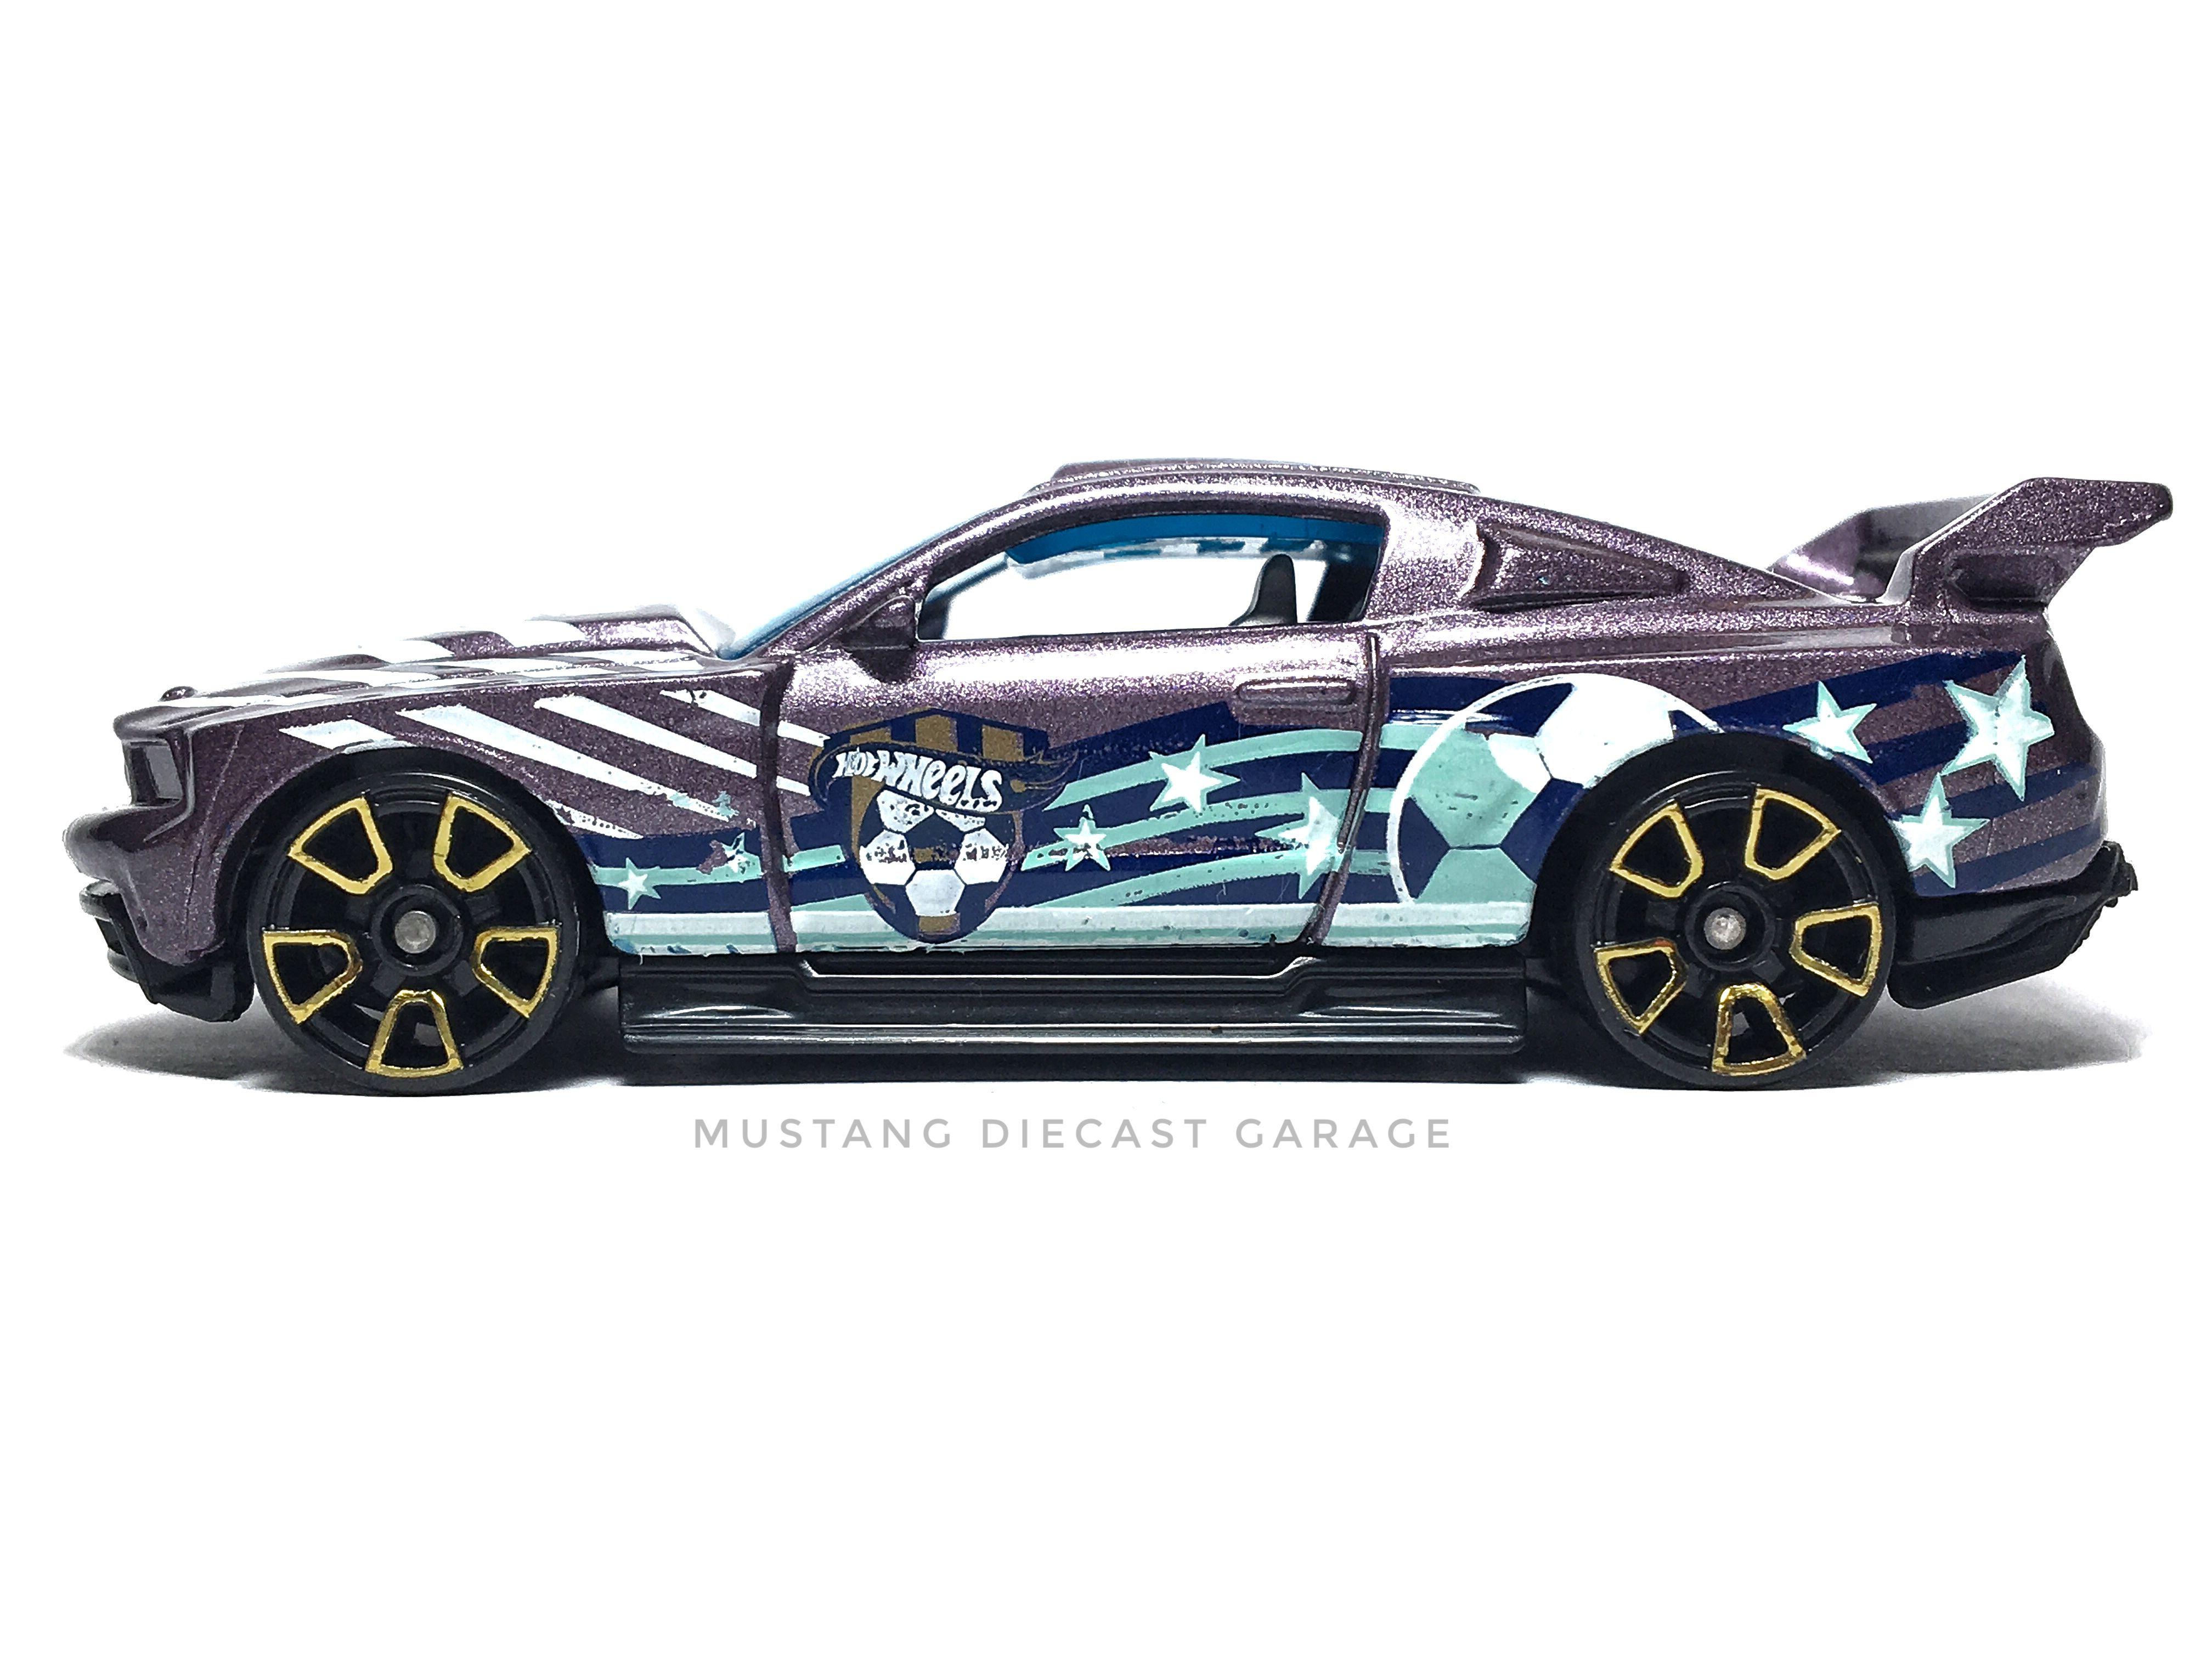 Hot Wheels Custom 12 Ford Mustang Series 2014 Hw City ส ม วง 1